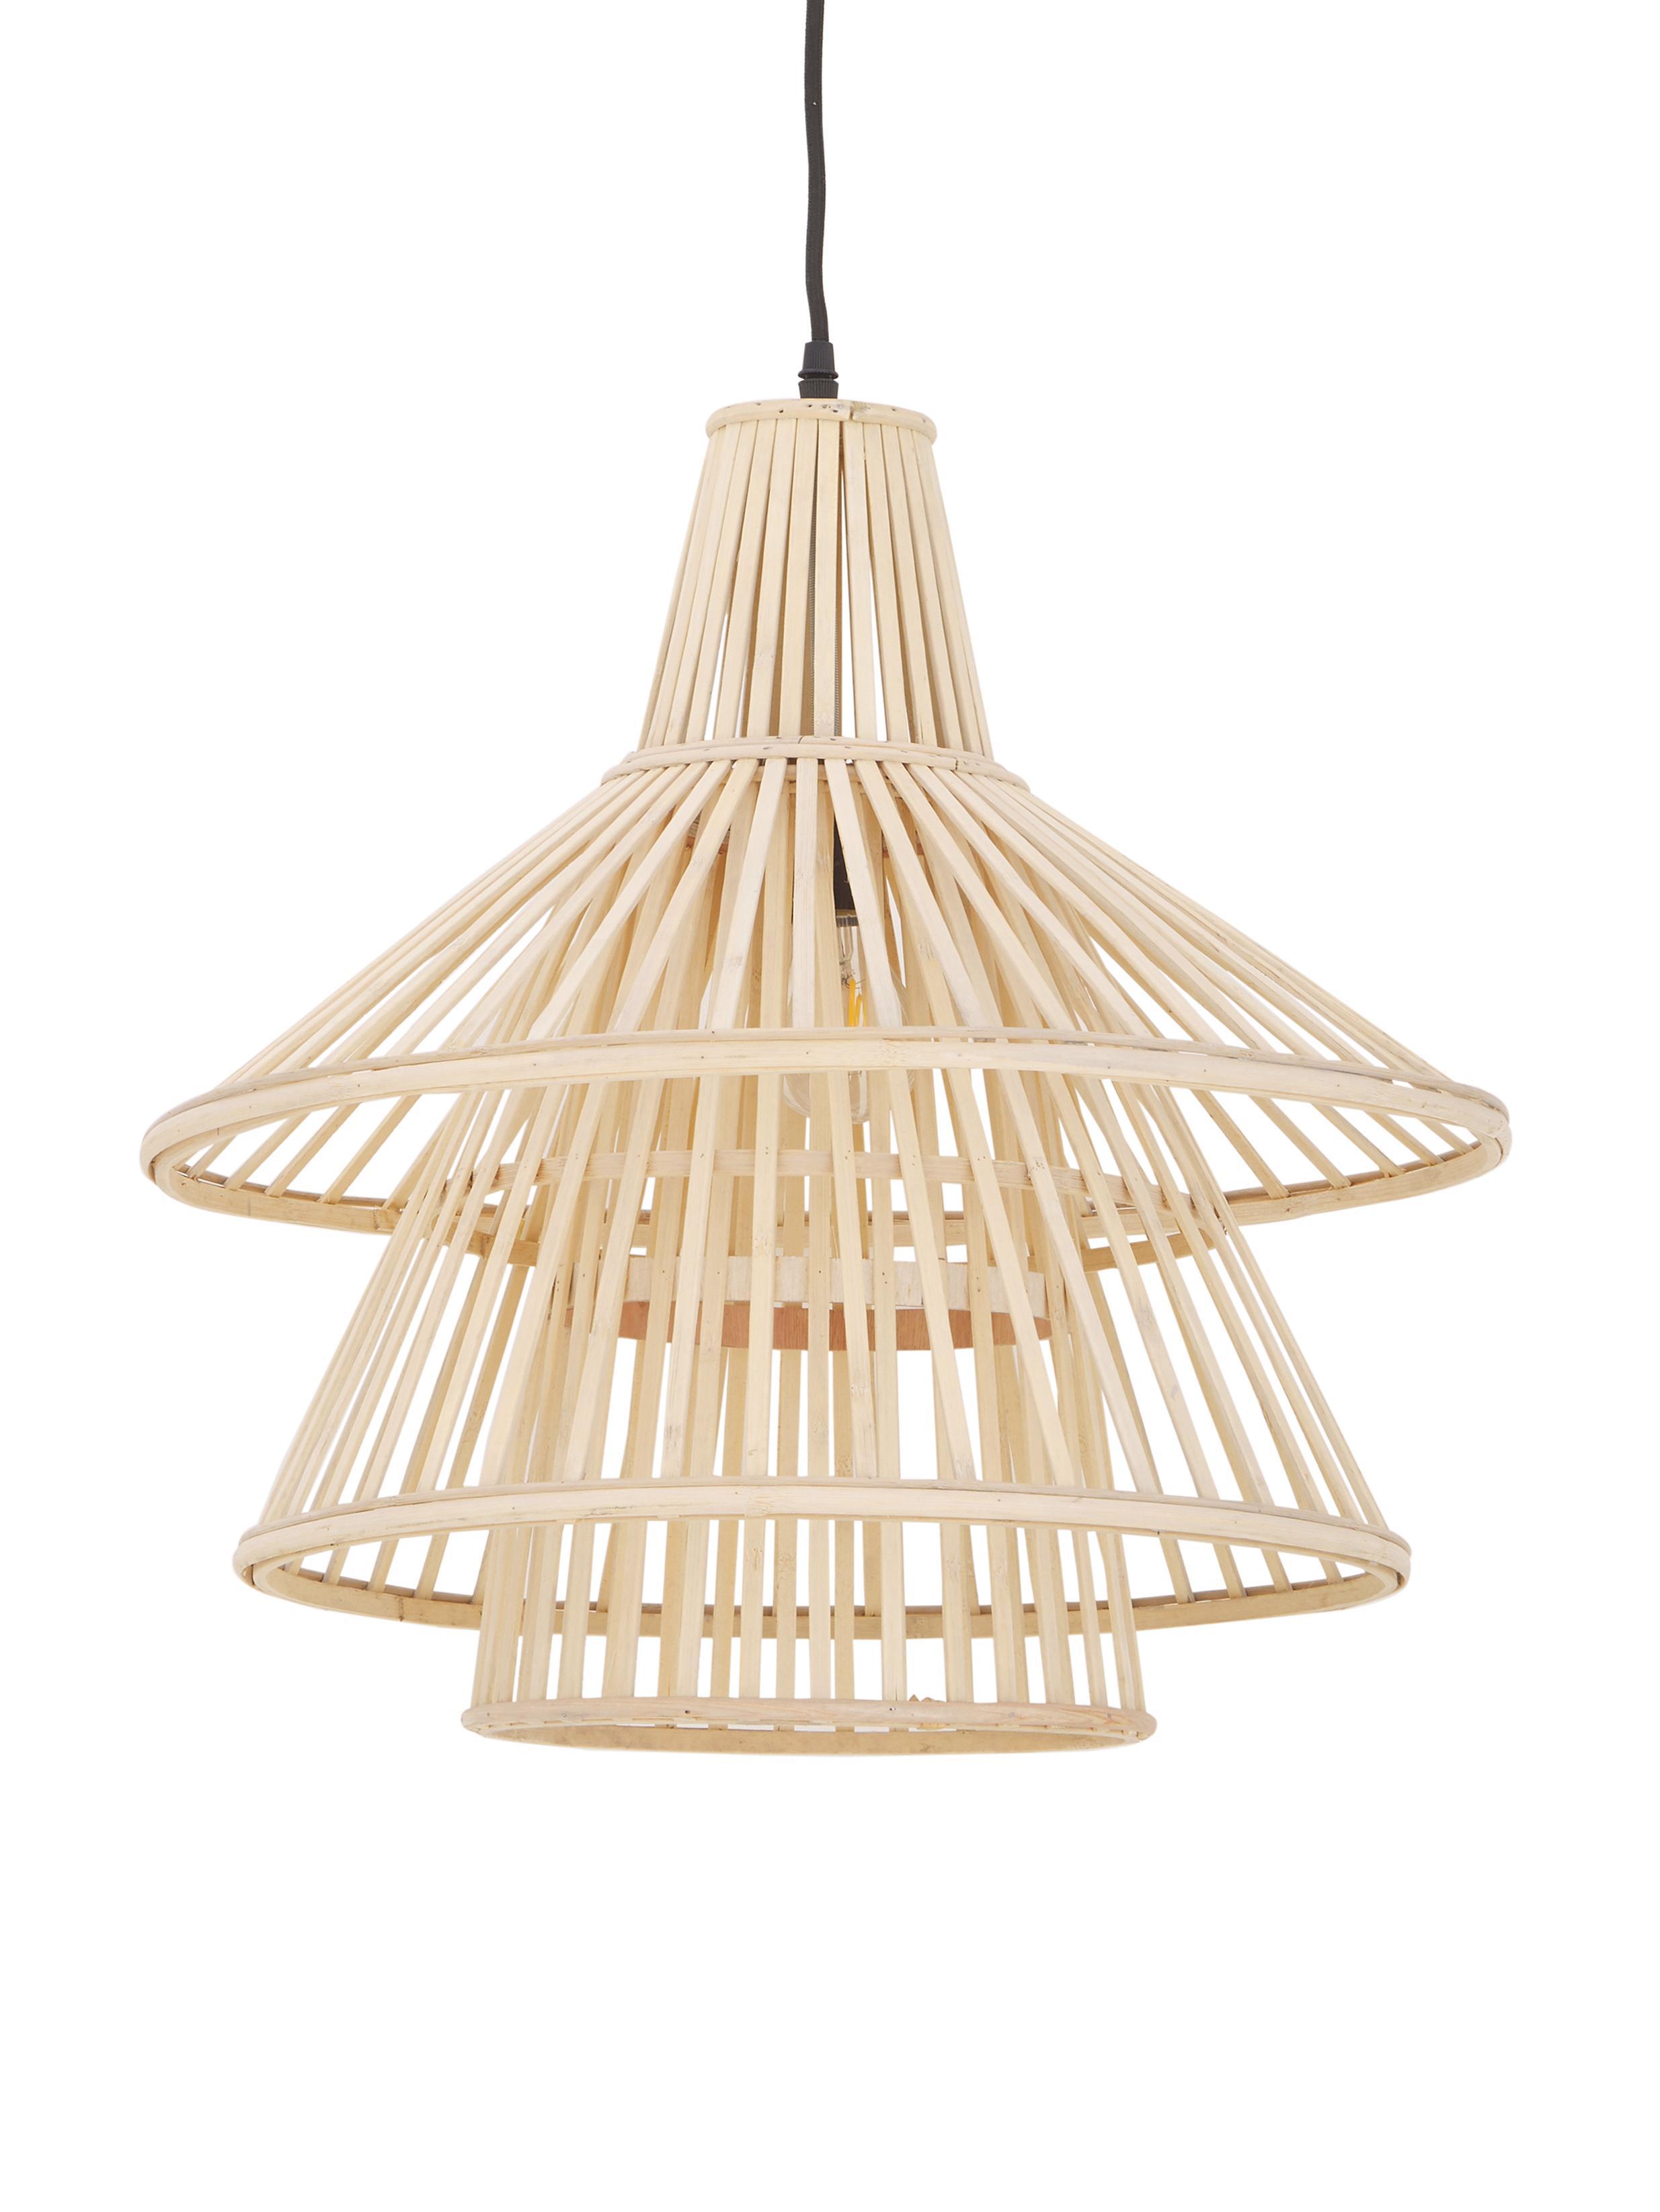 Lámpara de techo de bambú Kamil, Pantalla: bambú, Cable: tela, Beige, negro, Ø 48 x Al 51 cm